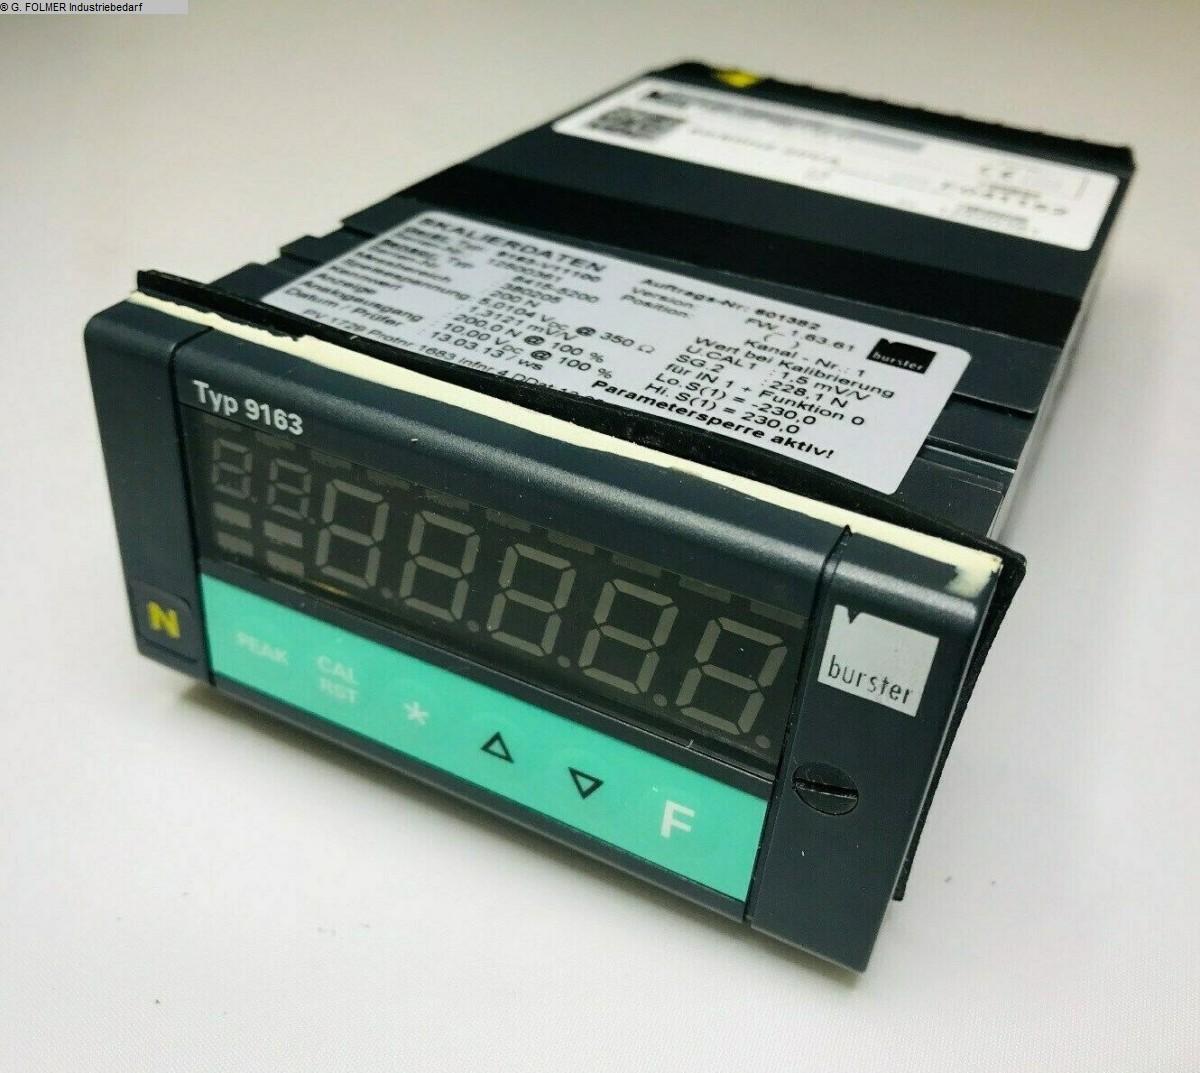 электроника / Приводная техника Электроника / Приводная техника BURSTER 9163